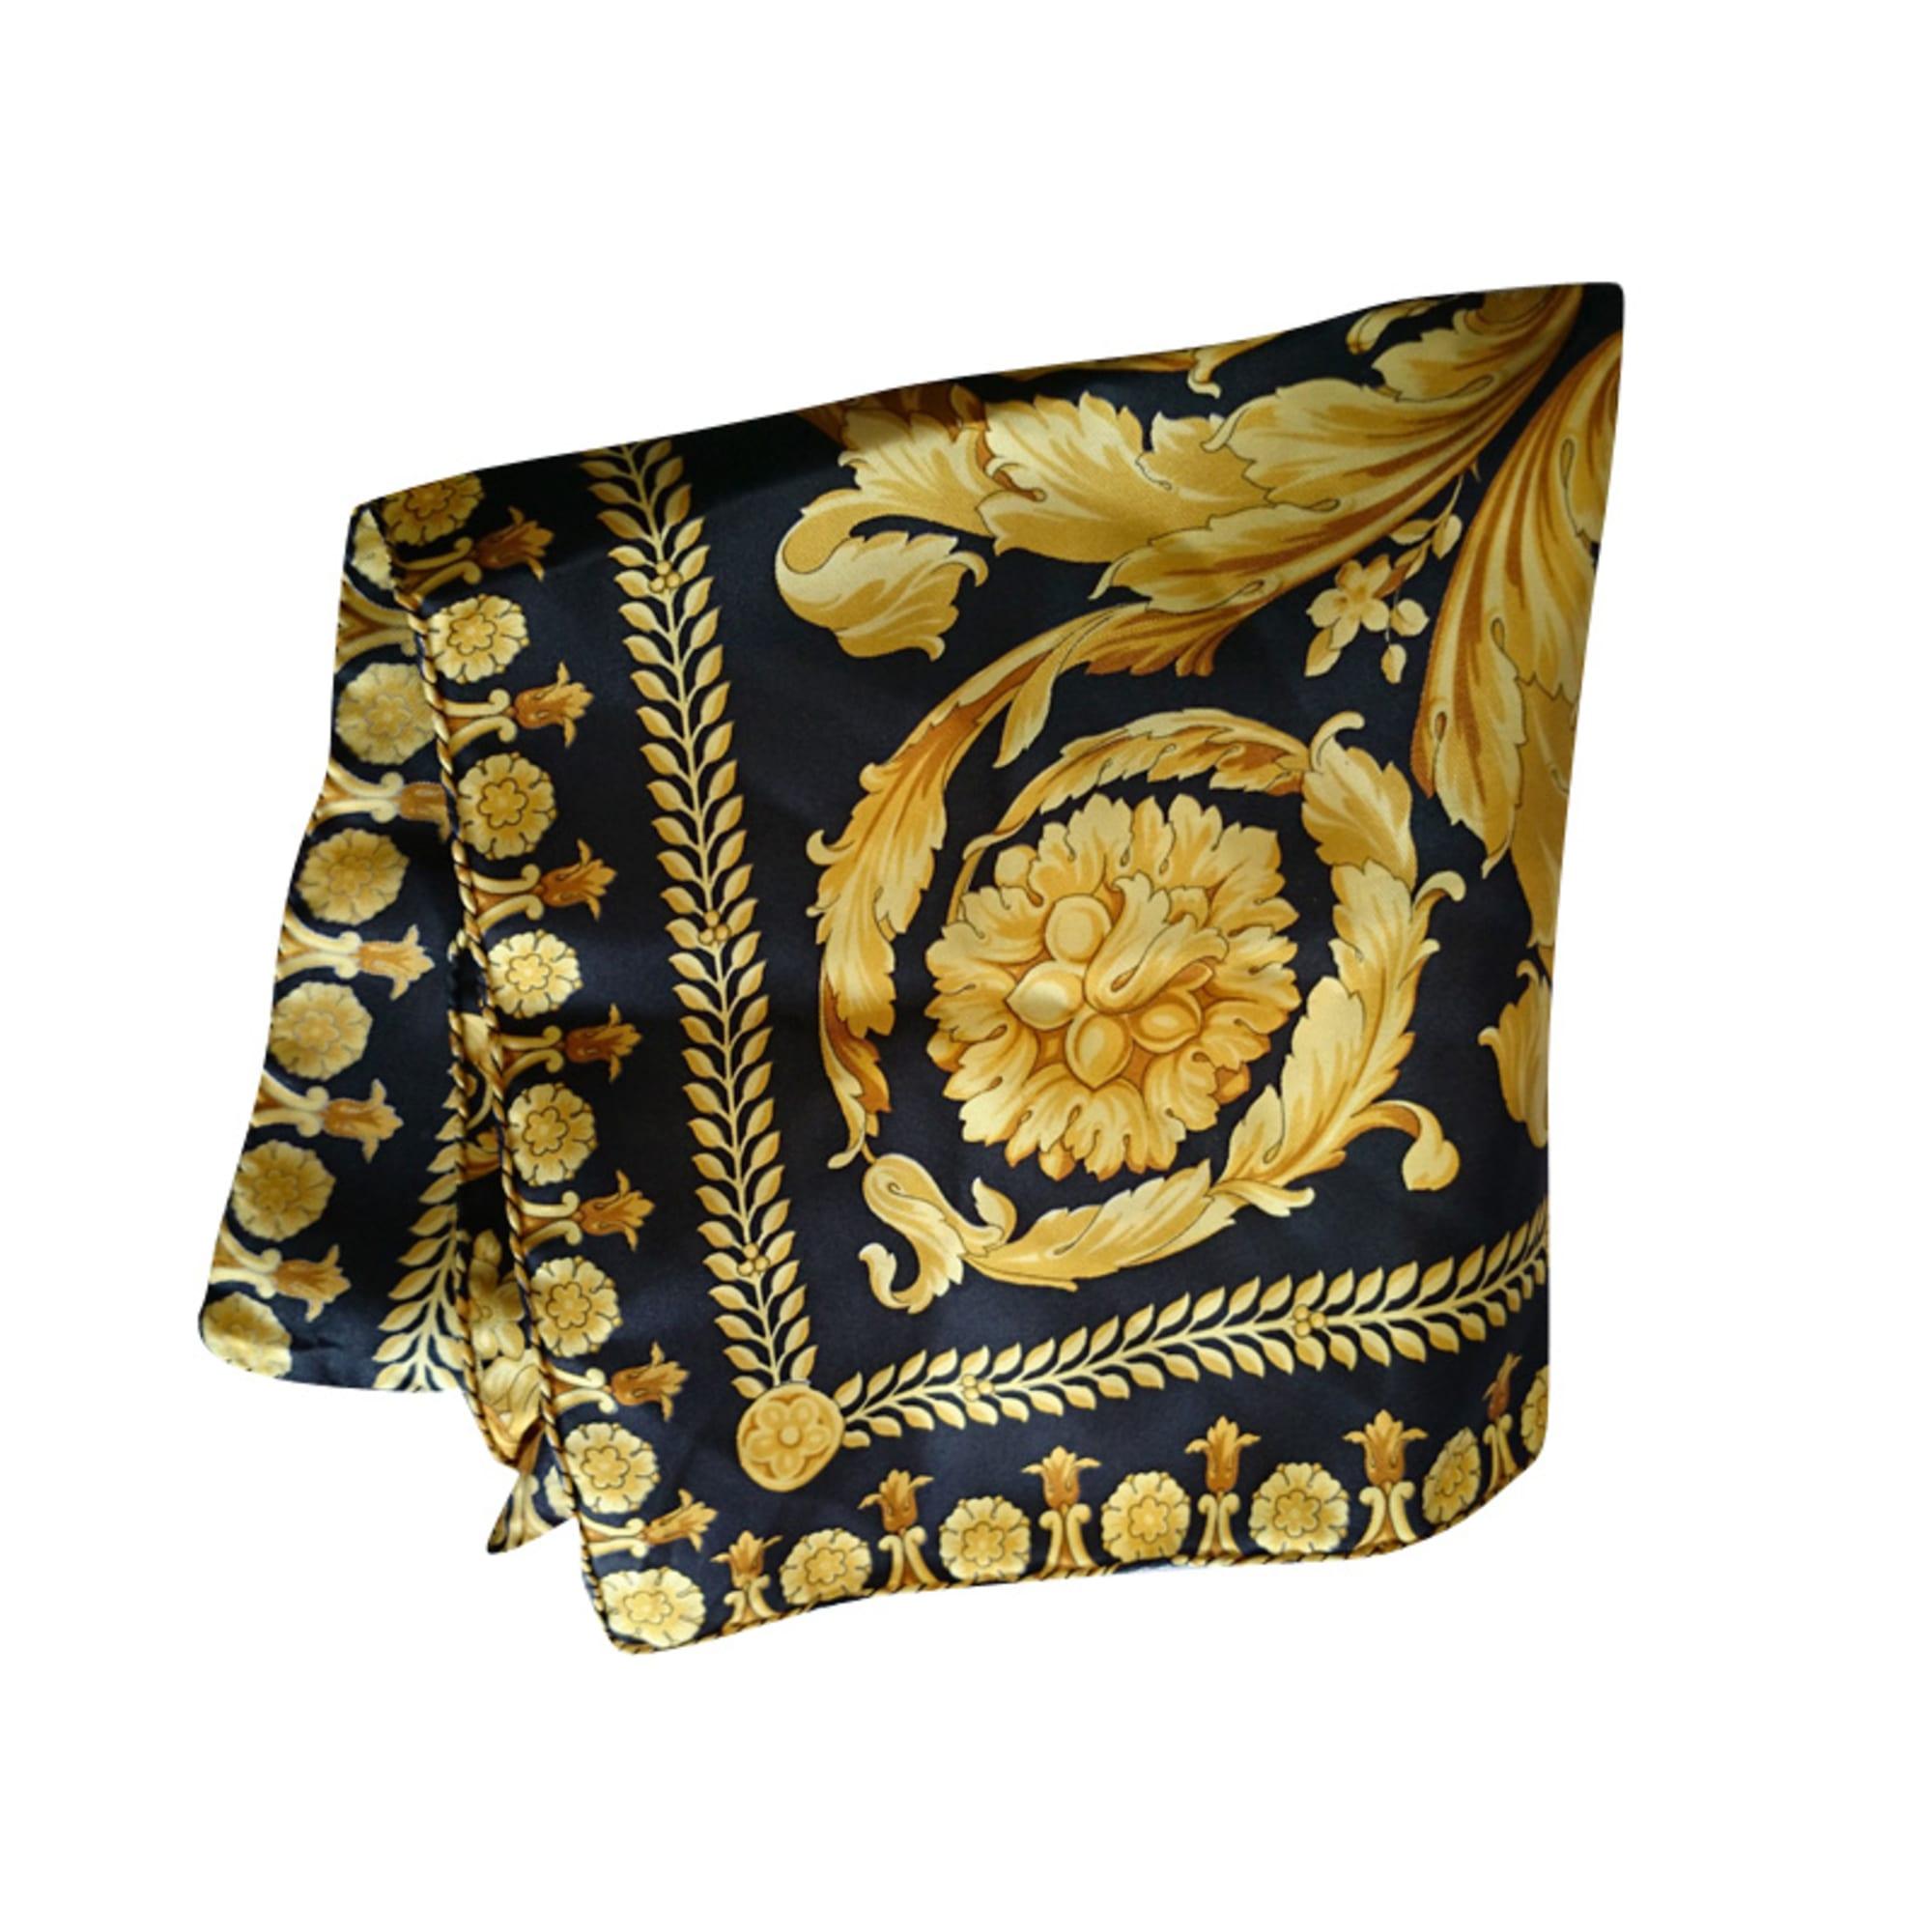 cb214900492f Foulard VERSACE doré vendu par Christian p165156 - 2882166